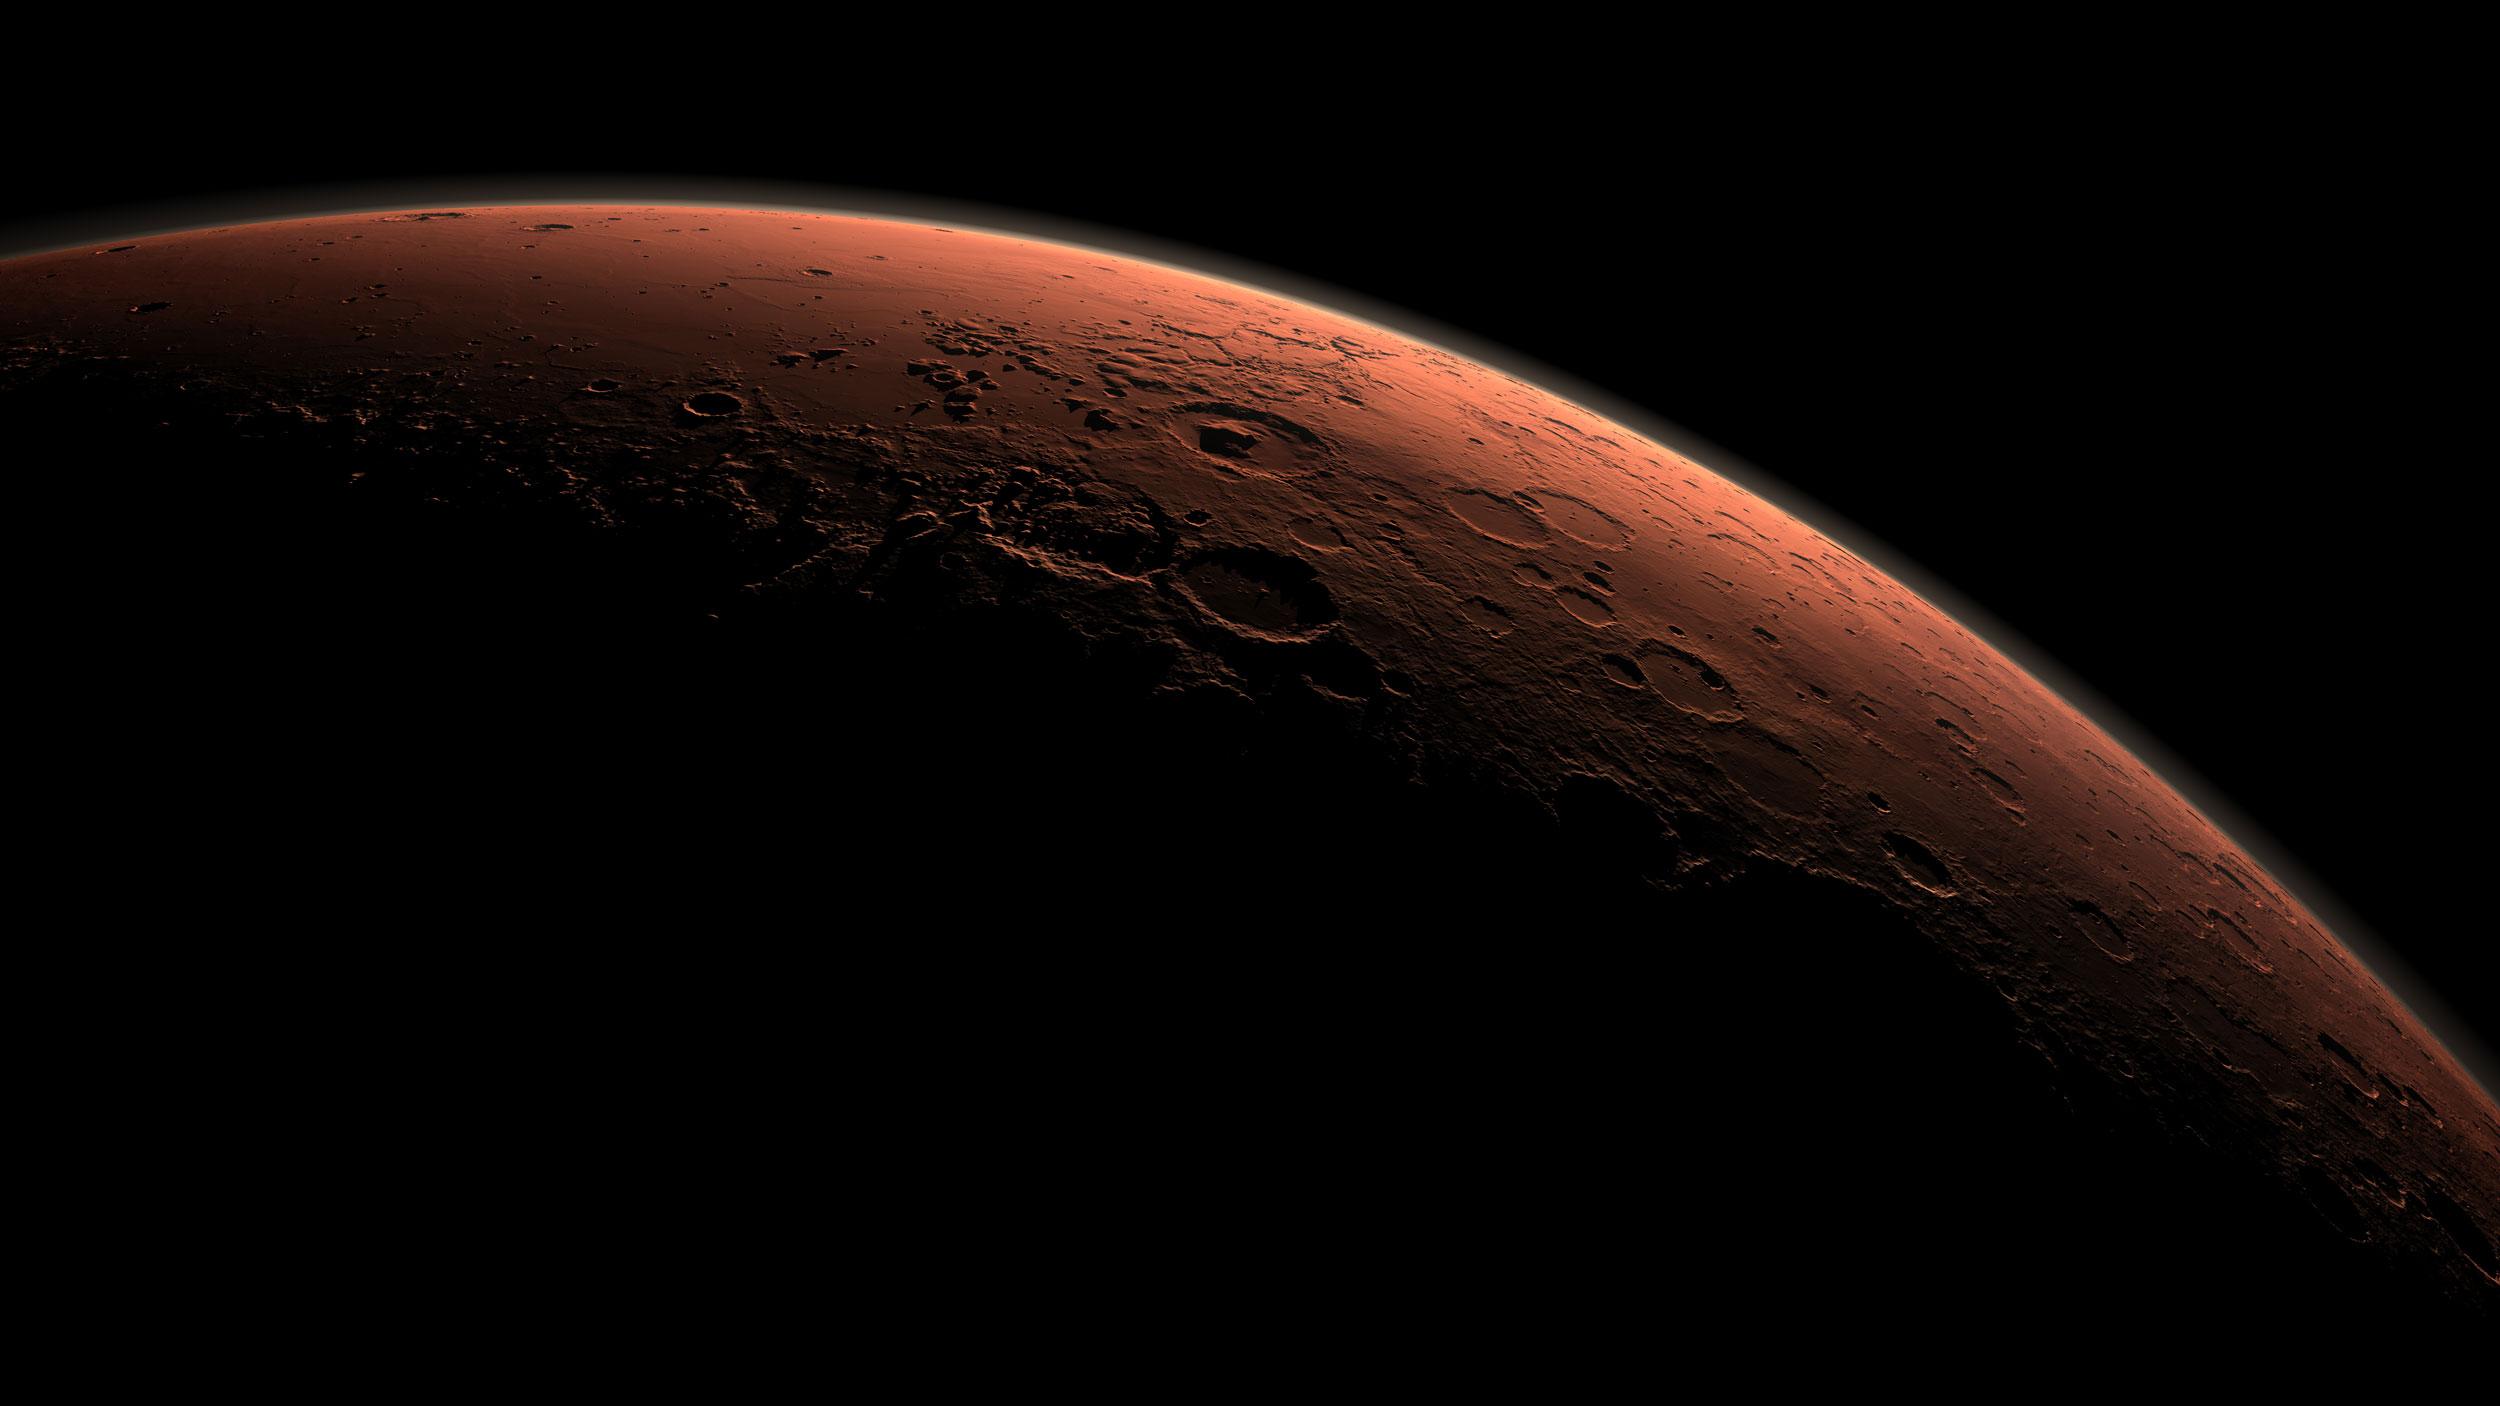 mars hd images curiosity